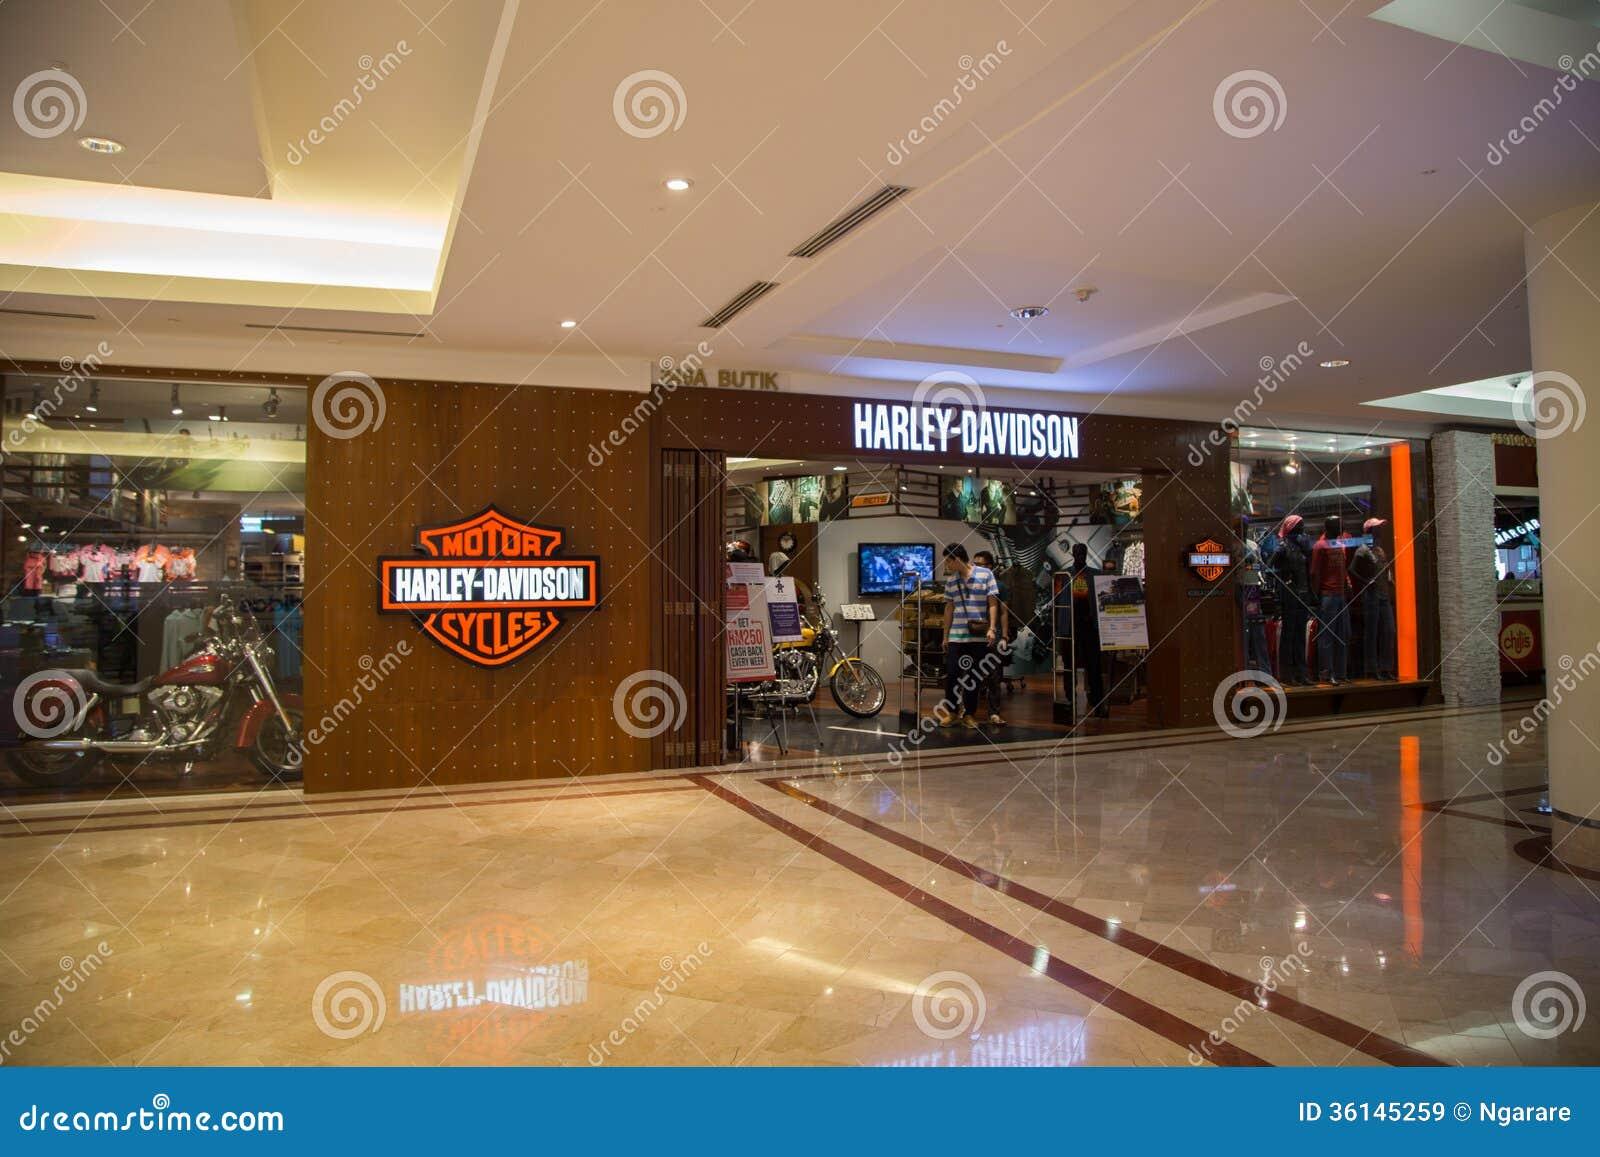 Harley davidson shop